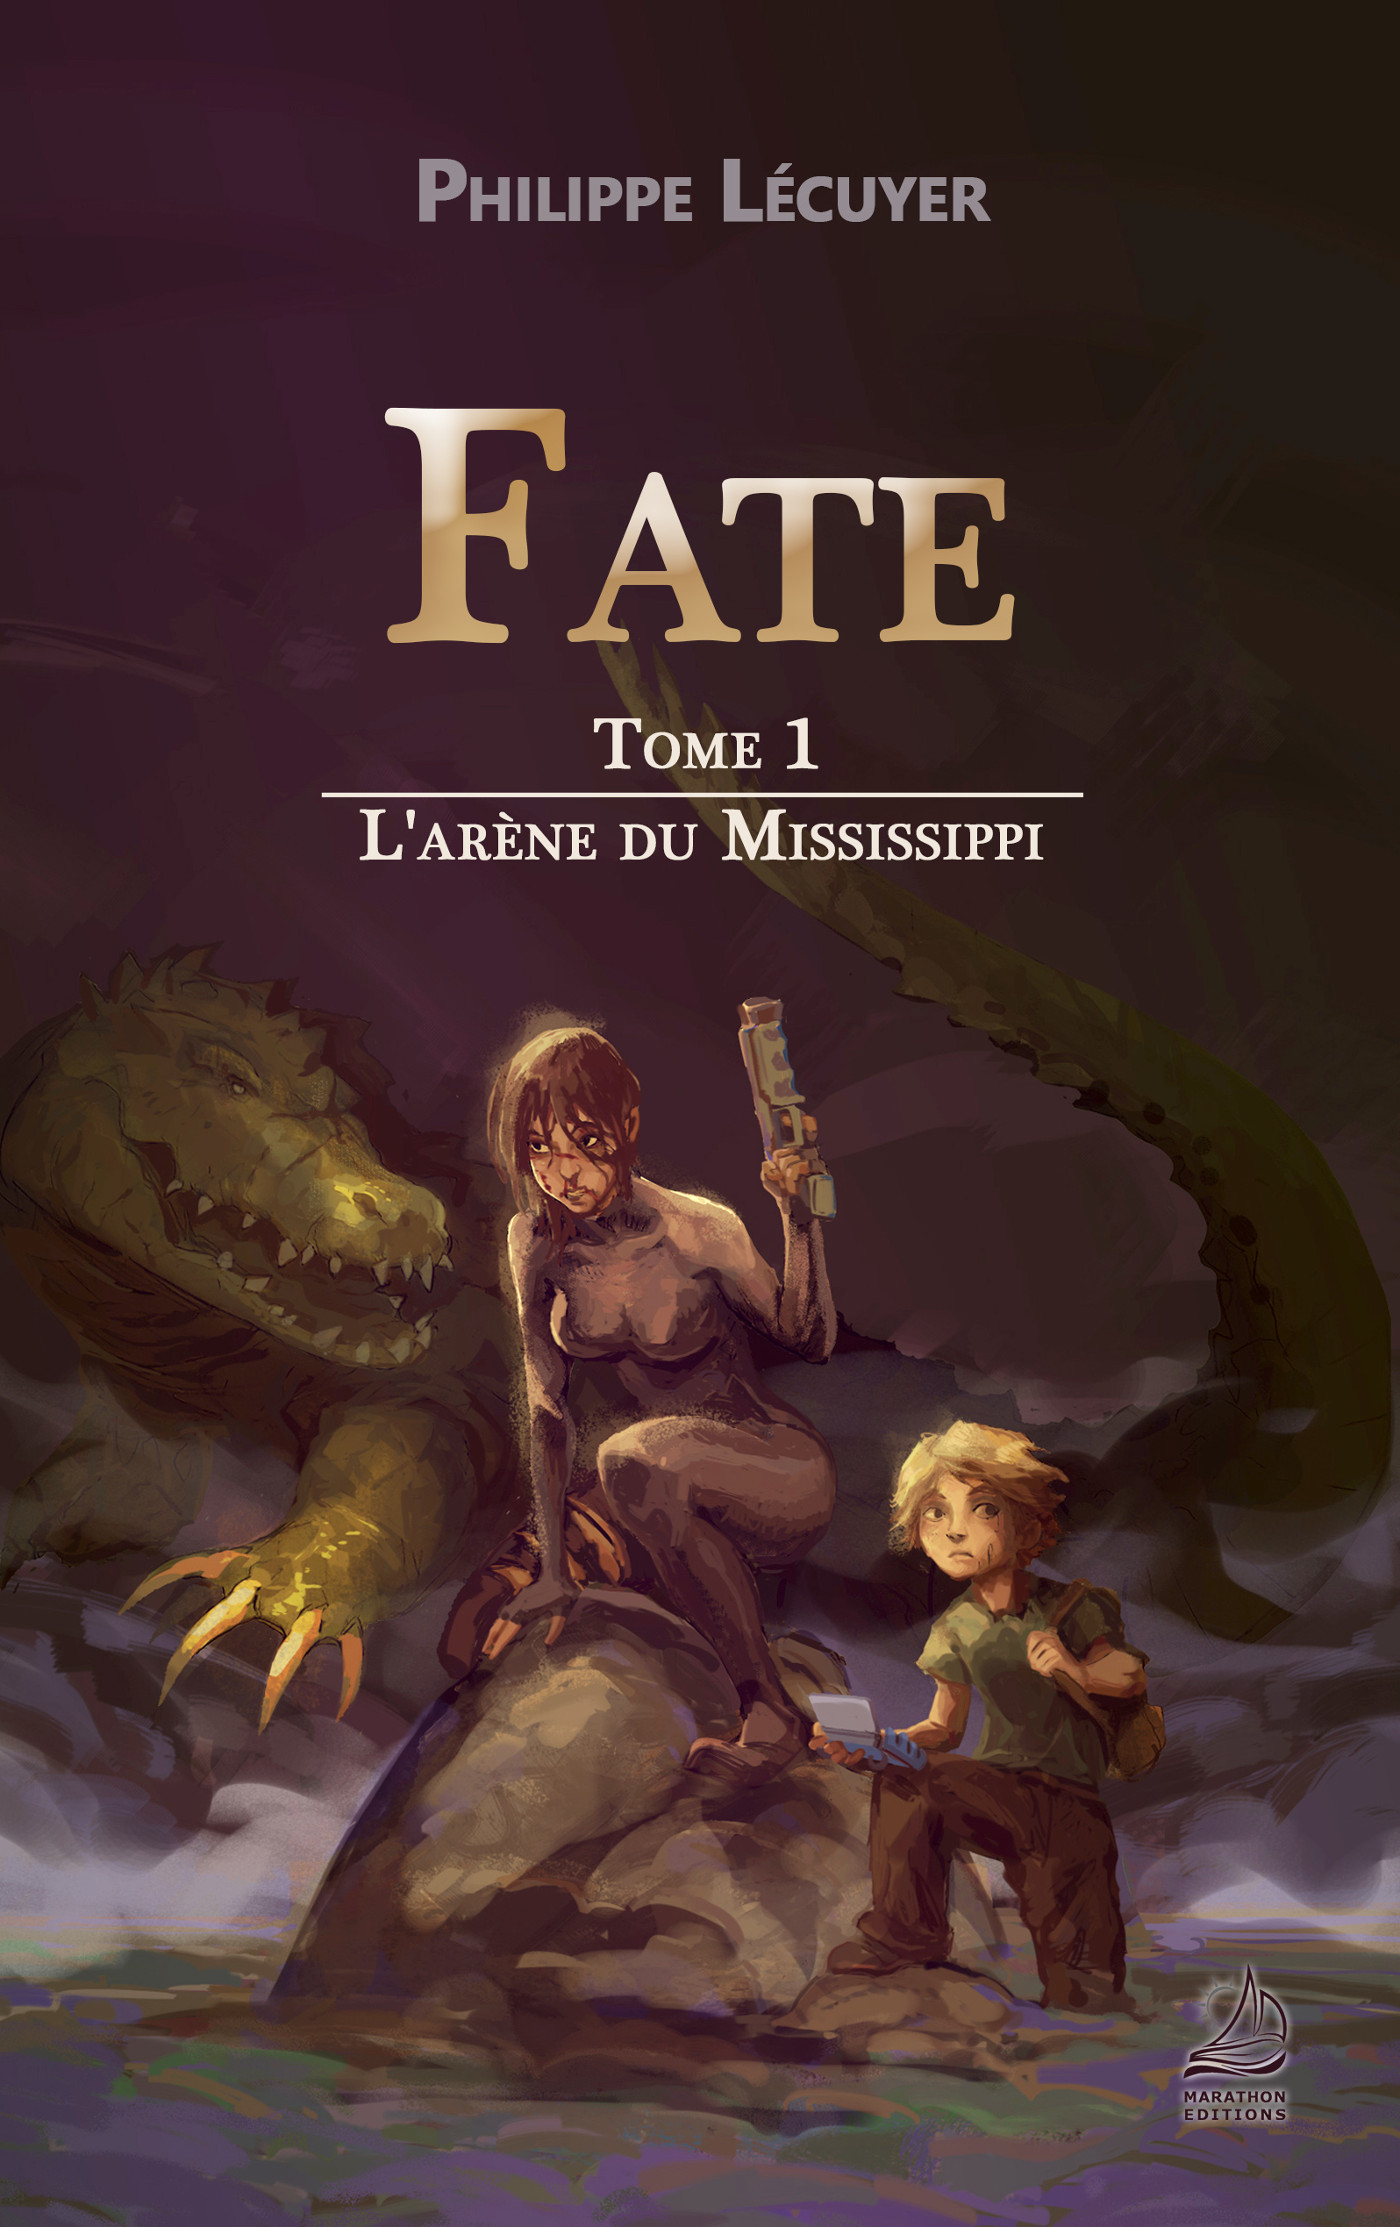 FATE - T01 - L'ARENE DU MISSISSIPPI